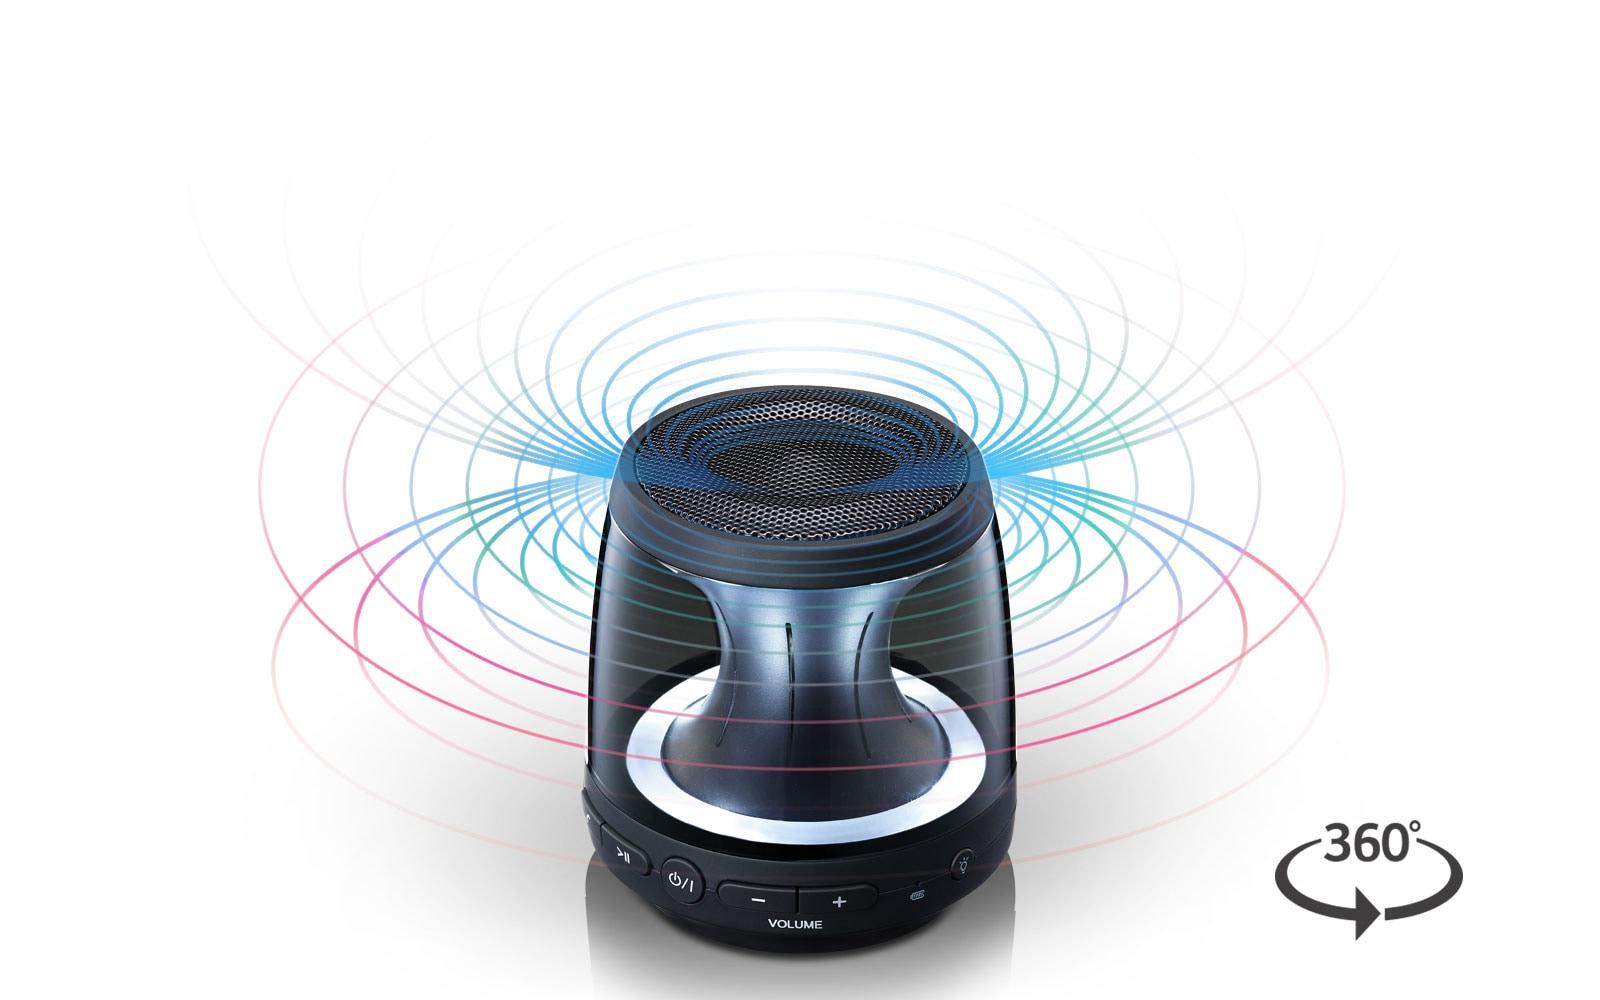 Lg Ph1 Portable Bluetooth Speaker India Waterproof Bts 06 Original 360 Degree Sound Effect